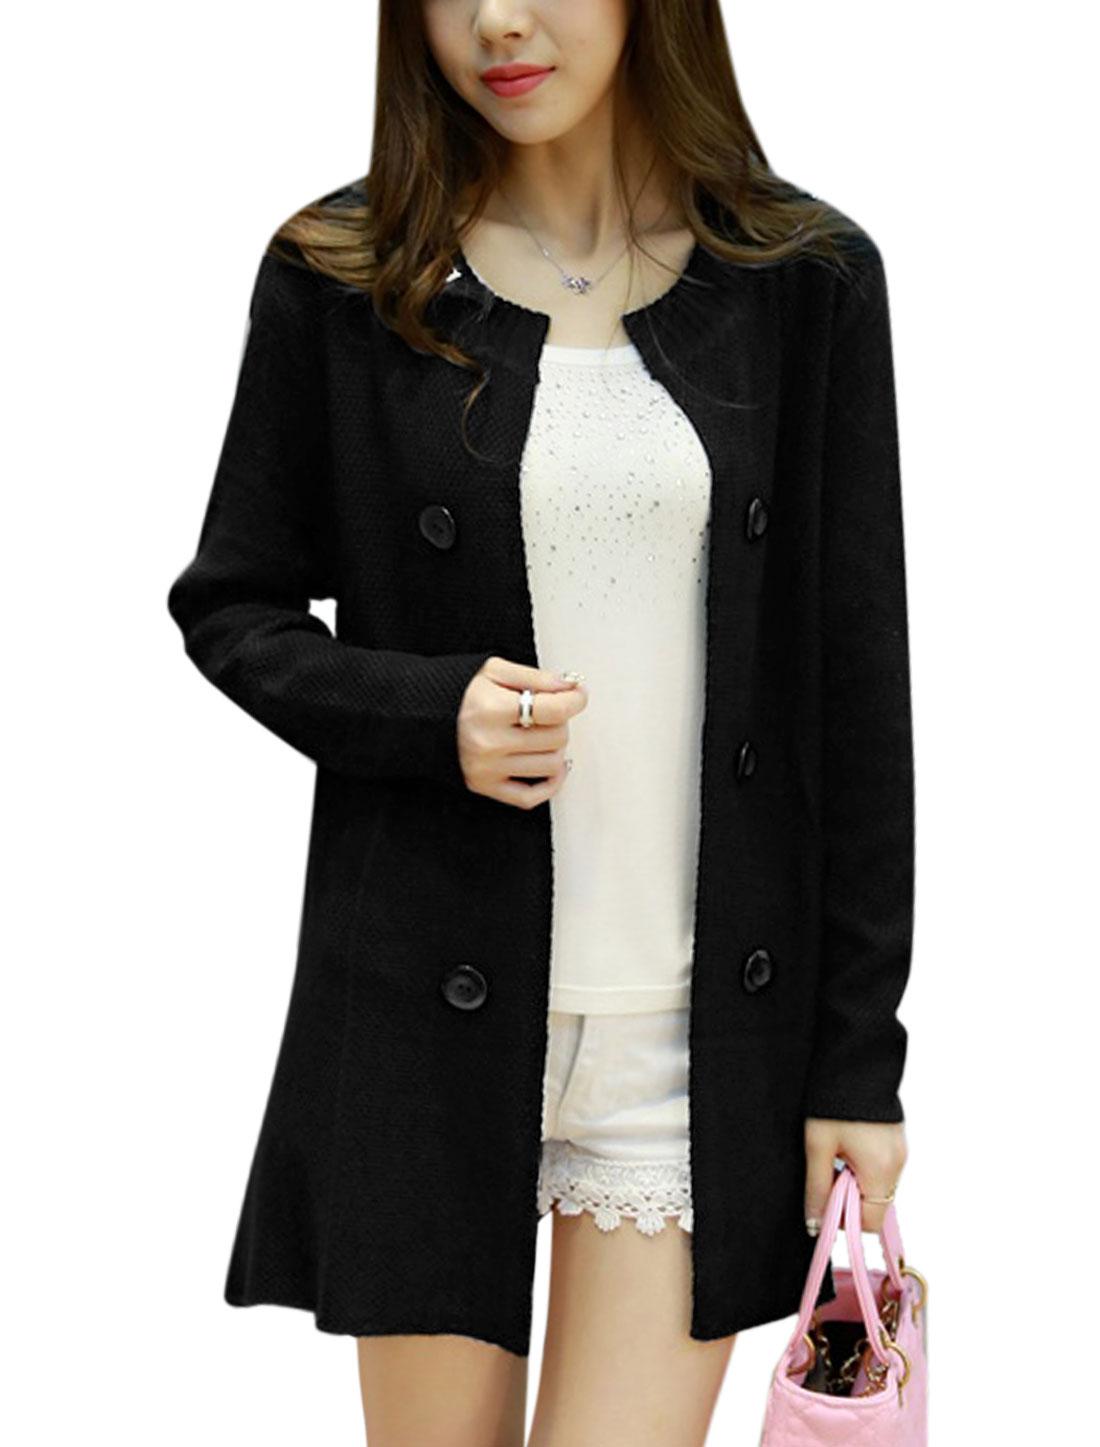 Women Panel Design Buttons Decor Tunic Knit Cardigan Black M